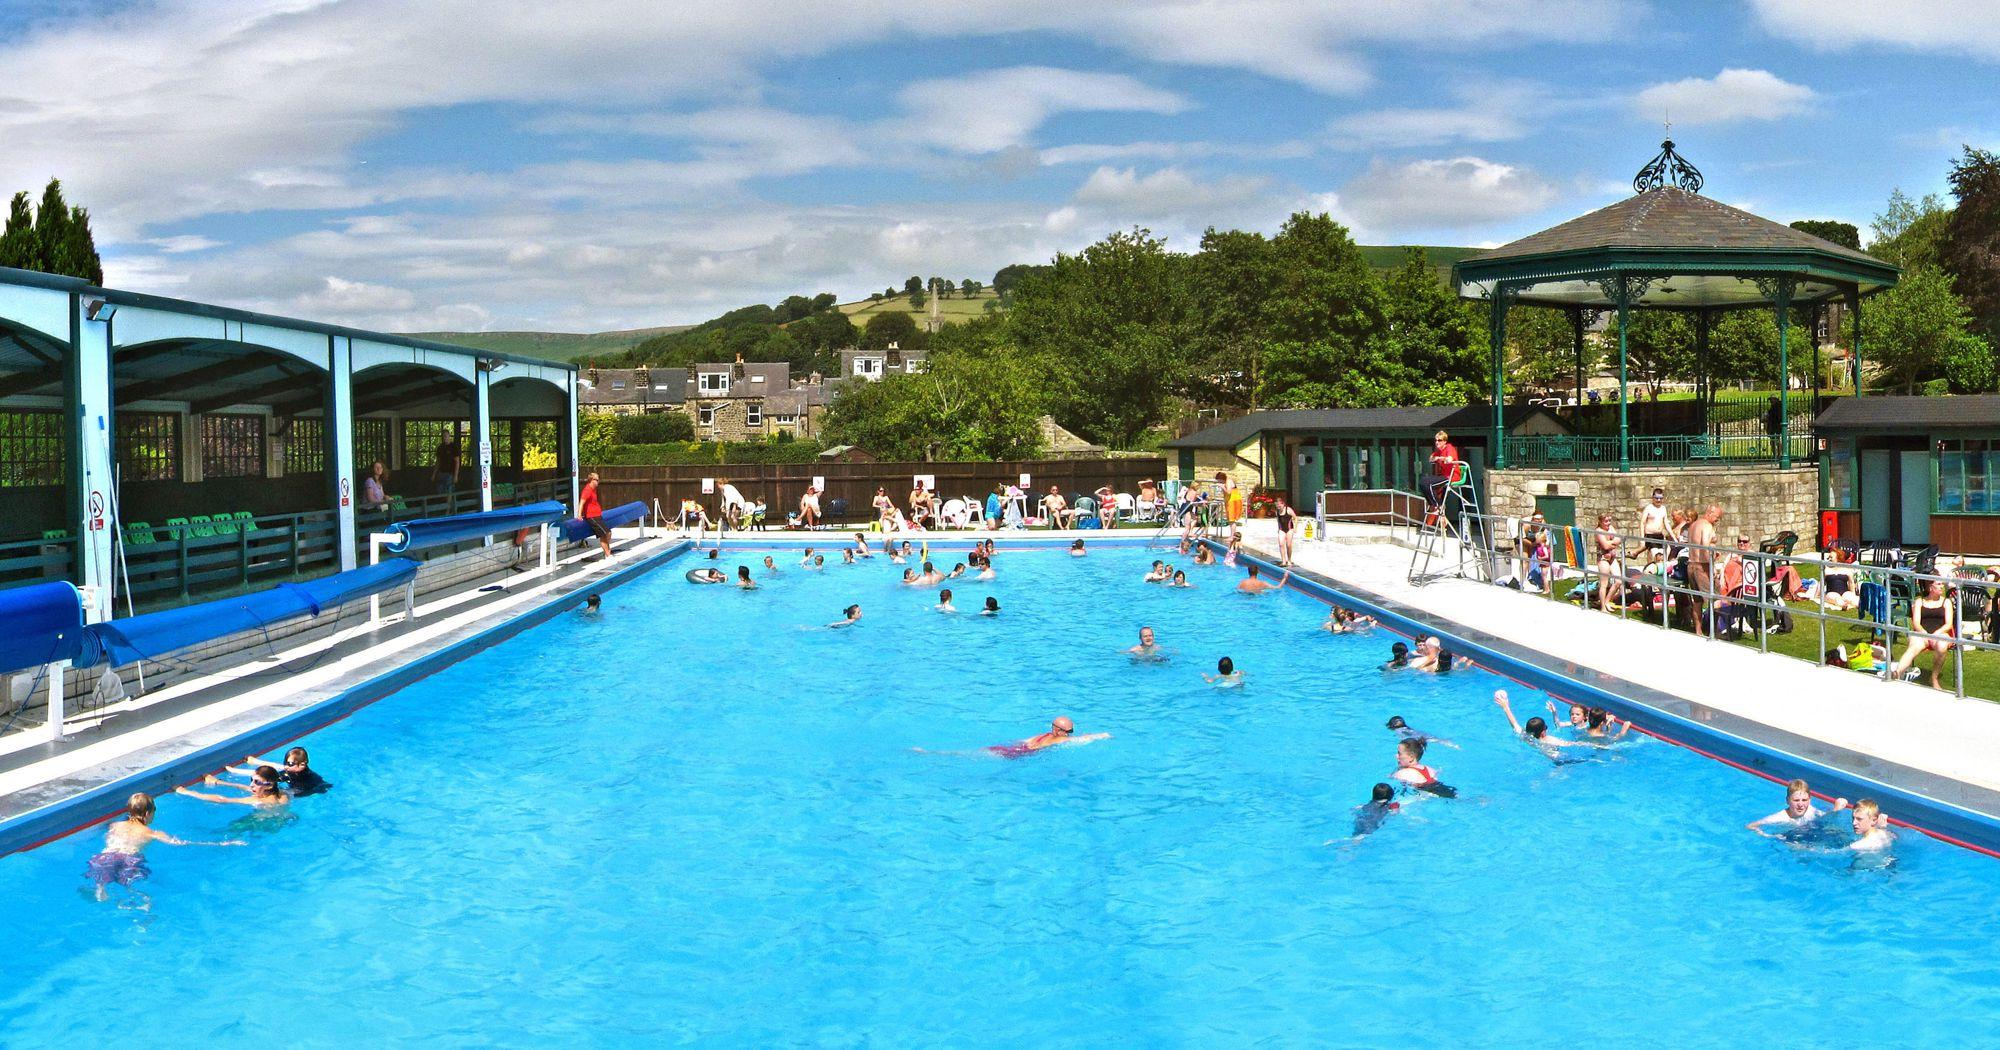 Hathersage Swimming Pool